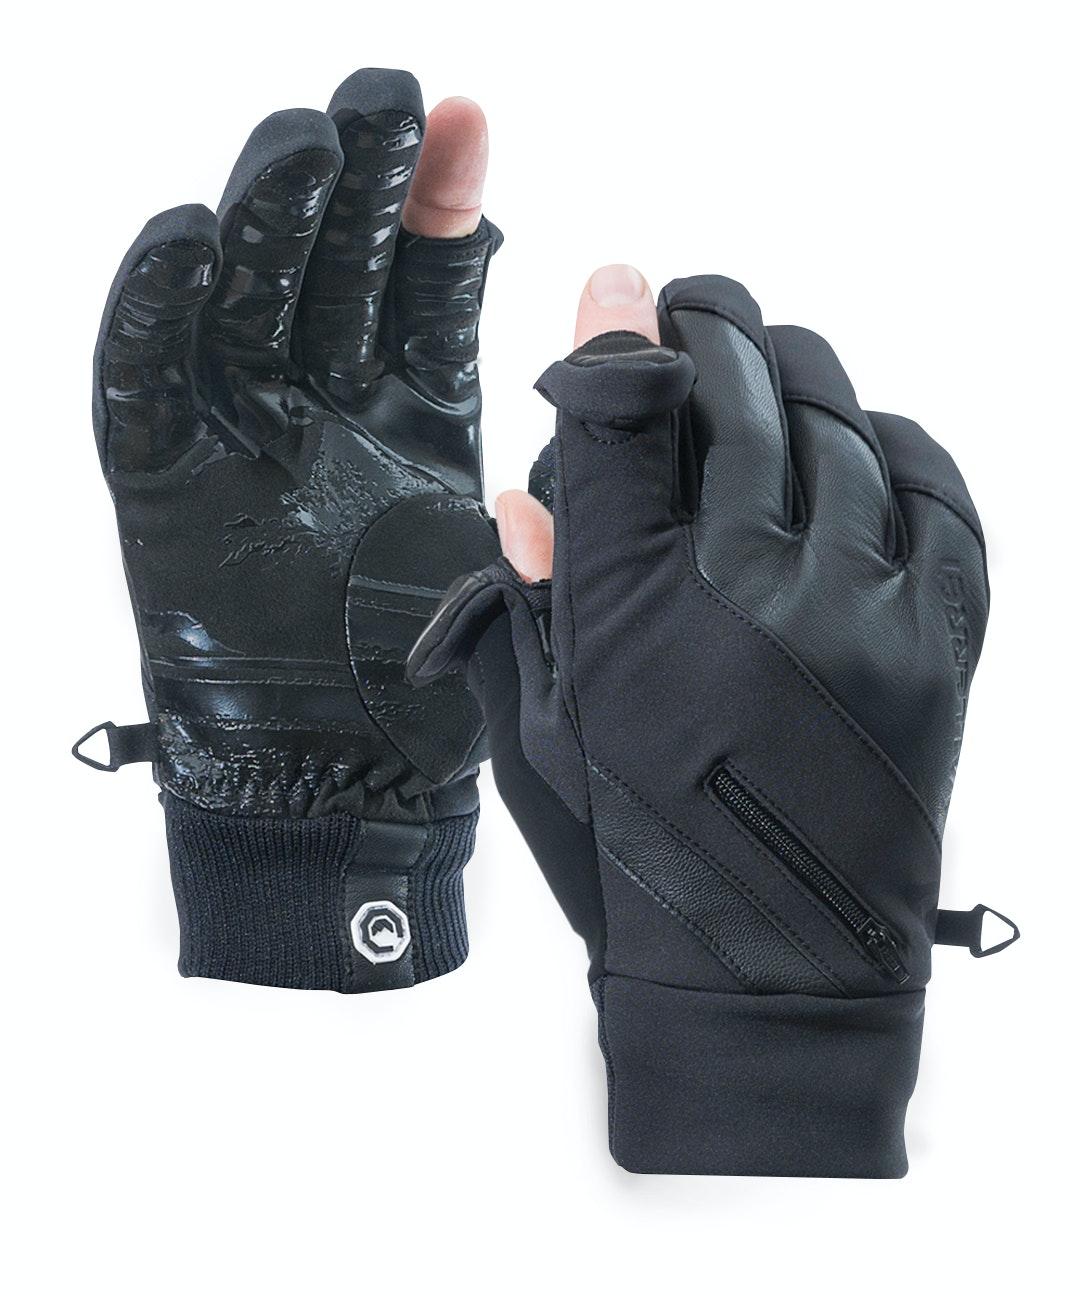 Vallerret Photography Glove | Markhof Pro Model